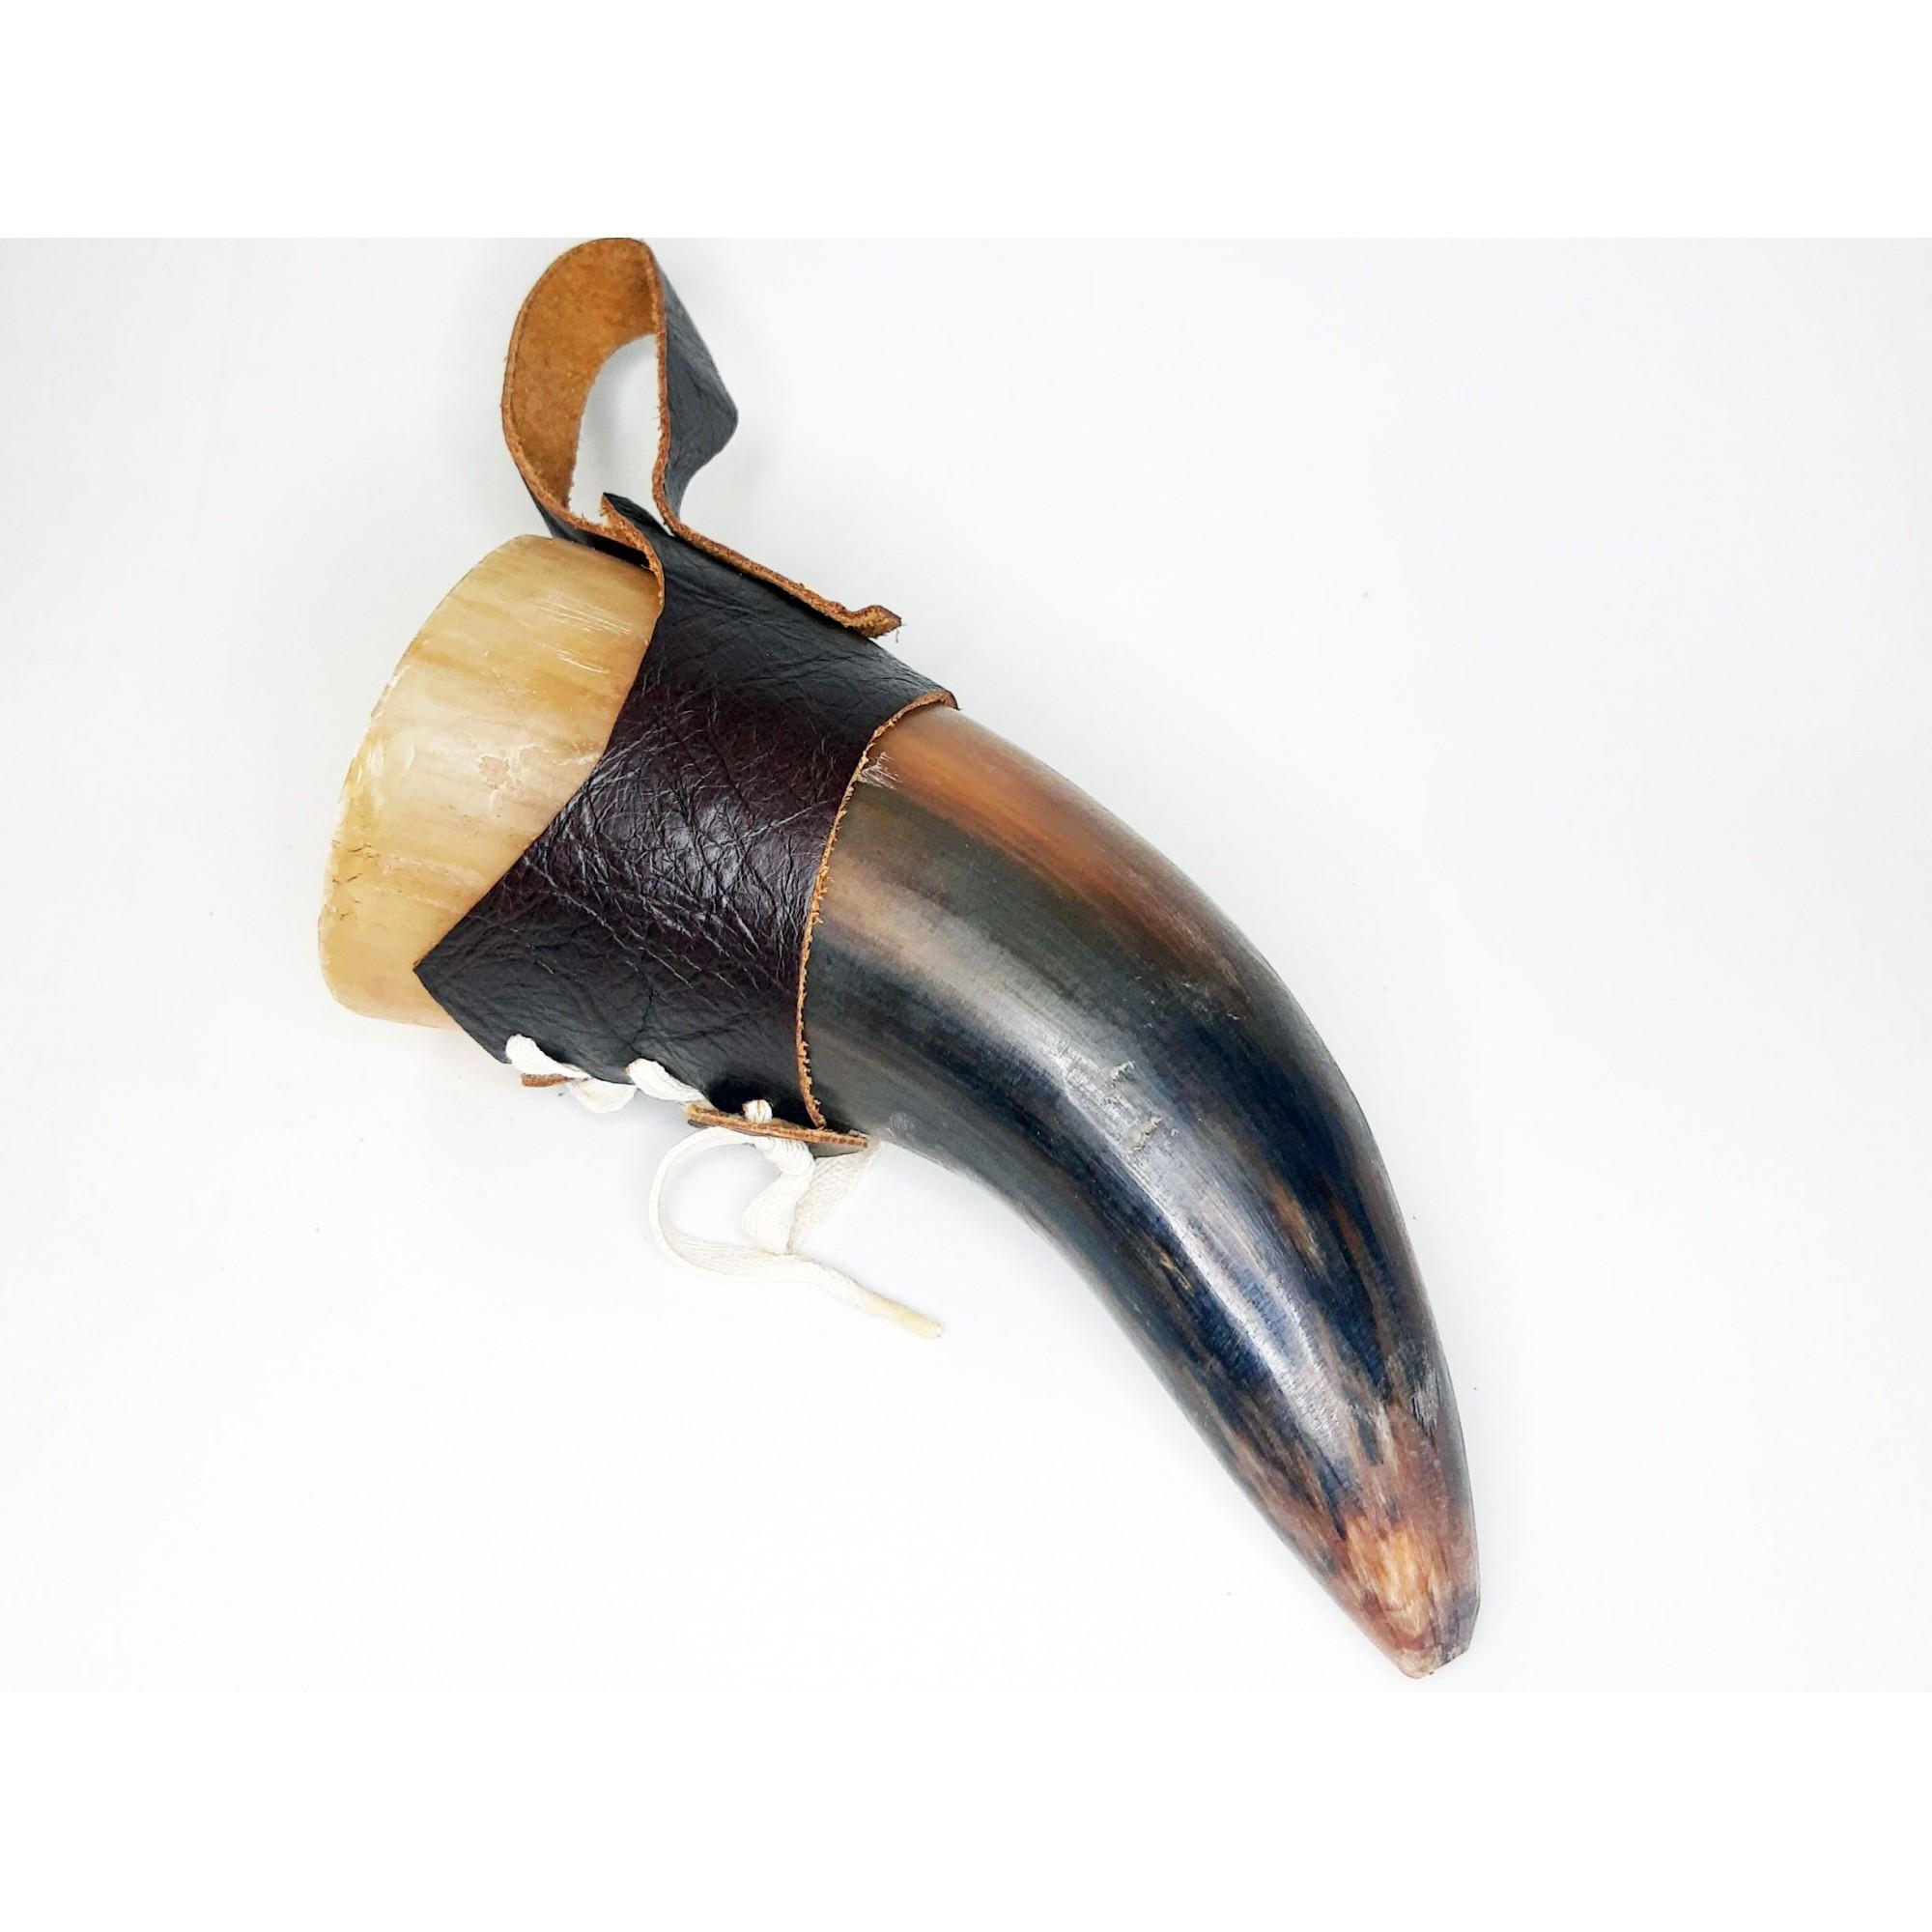 Drinking Horn 3 - 200 ml